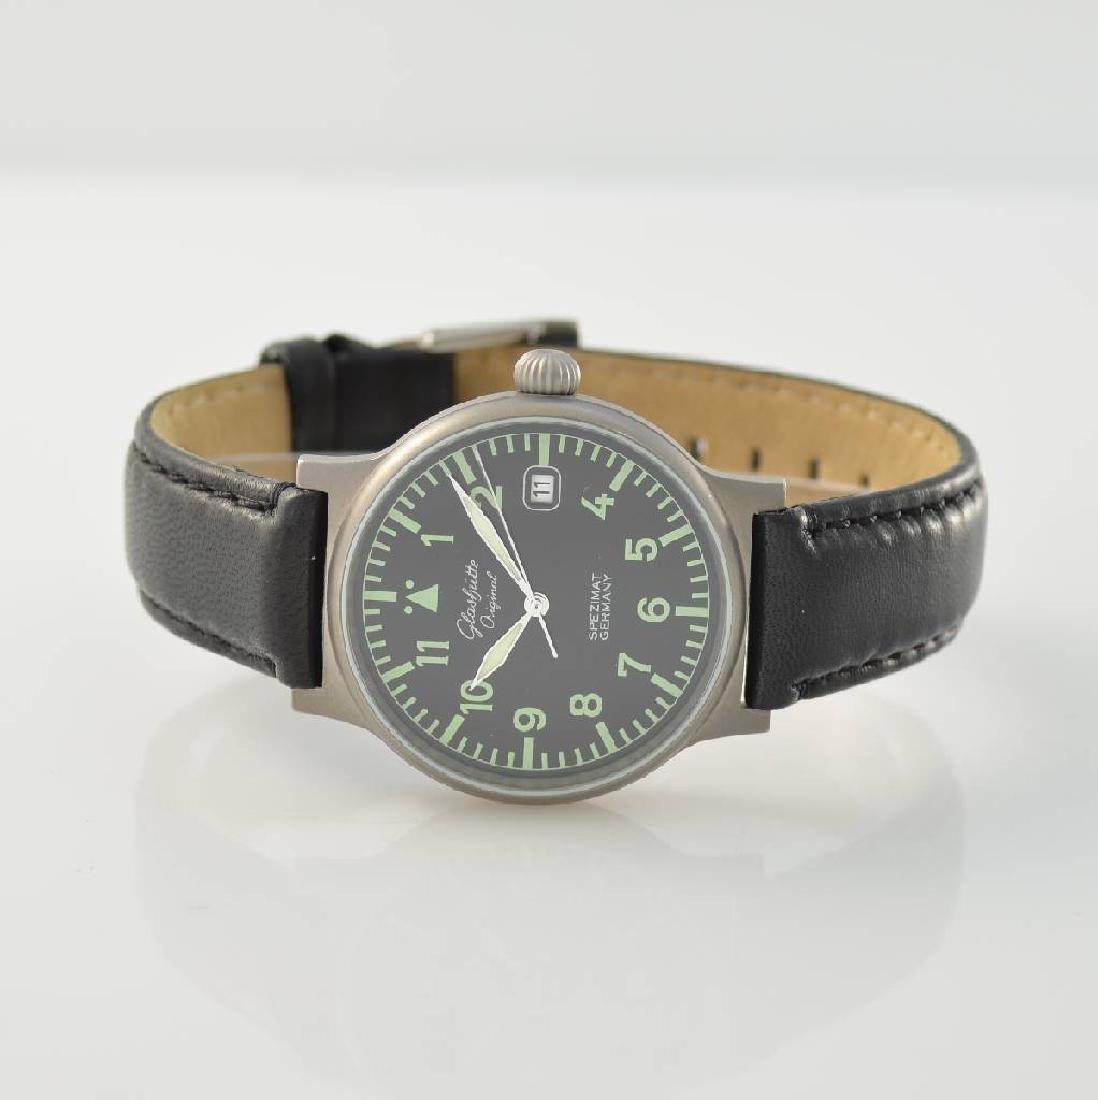 GLASHUTTE ORIGINAL Spezimat rare gents wristwatch